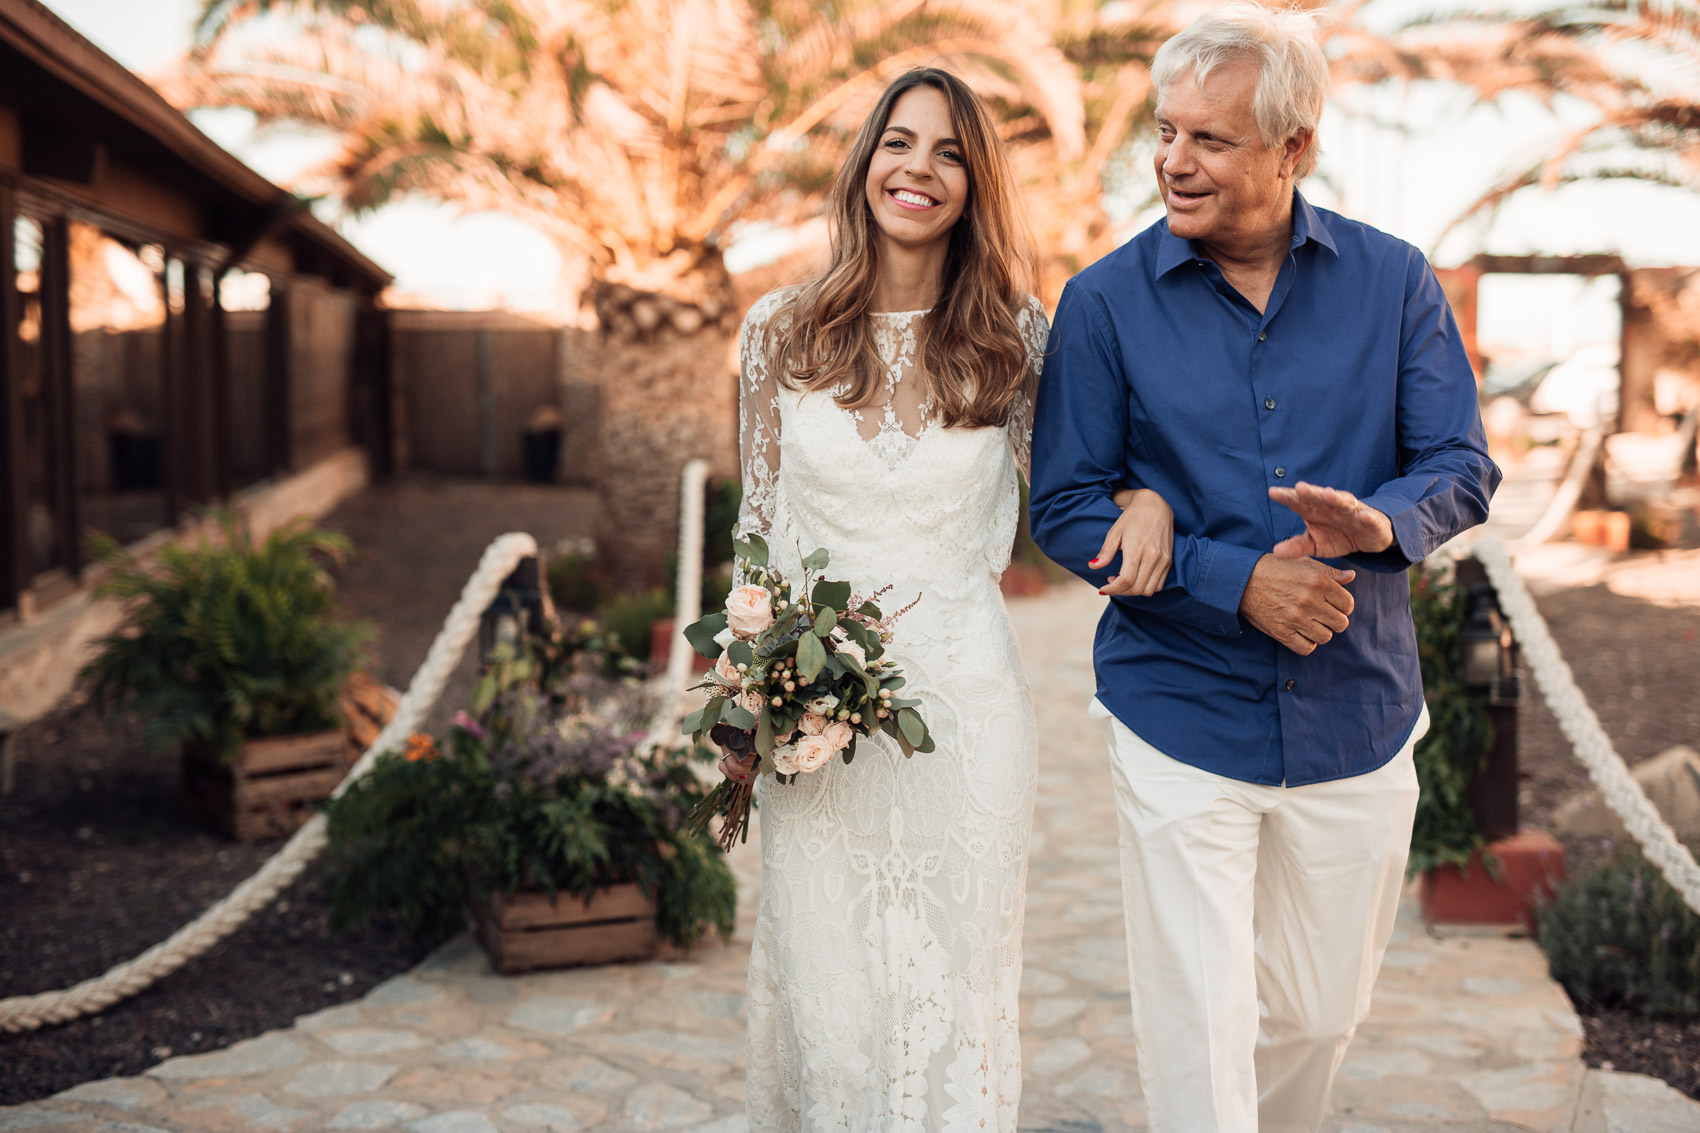 entrada novia padrino vestido wedding ramo flores